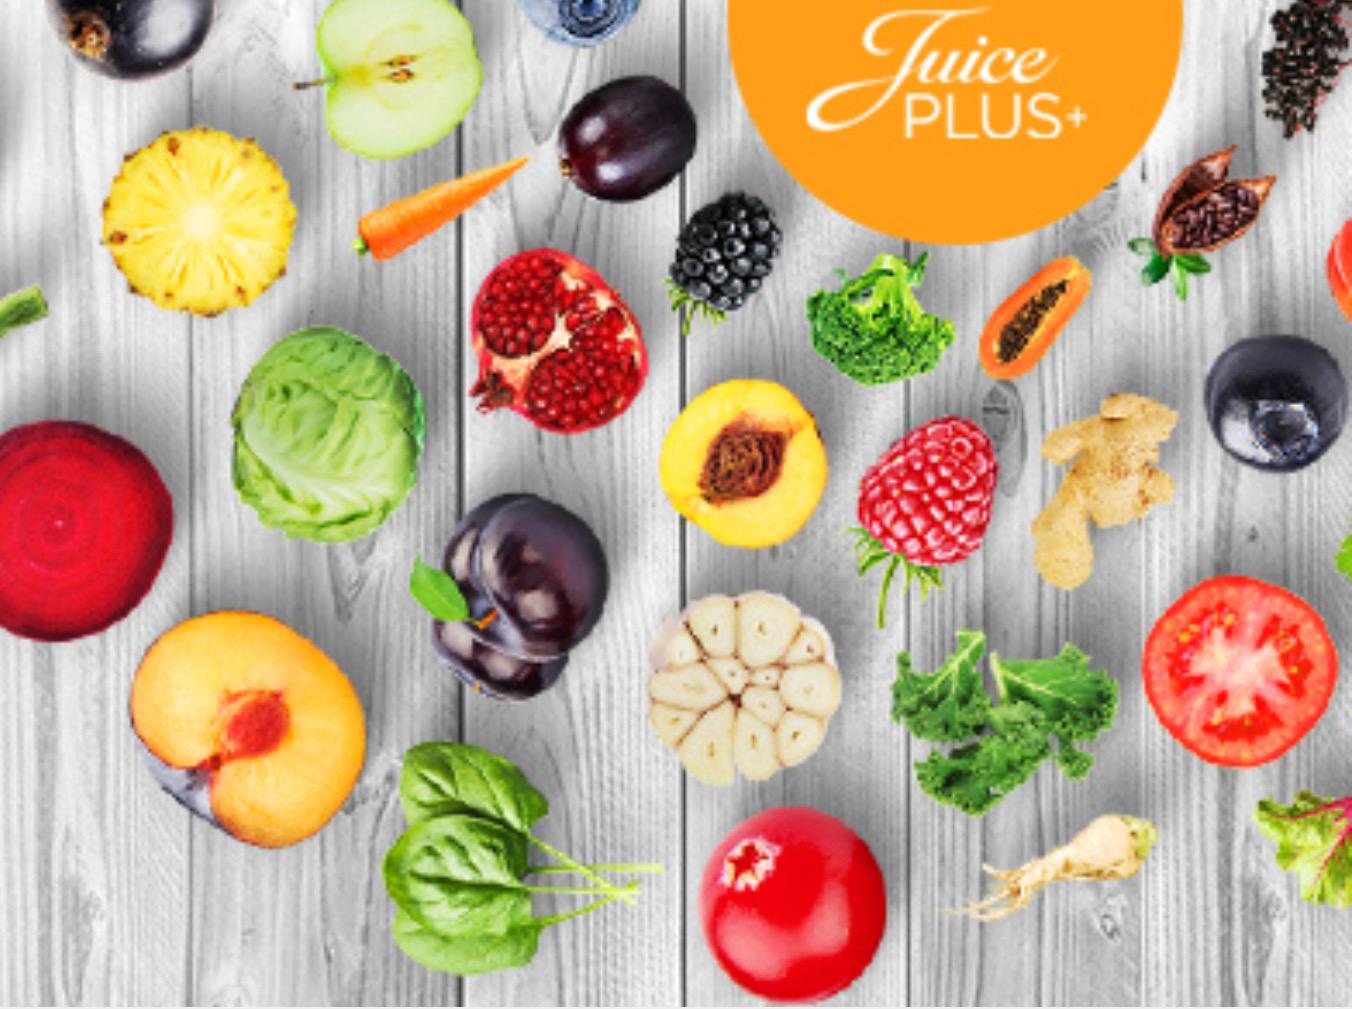 Juice Plus Online Shop Gesundheit Immunsystem Ernährung